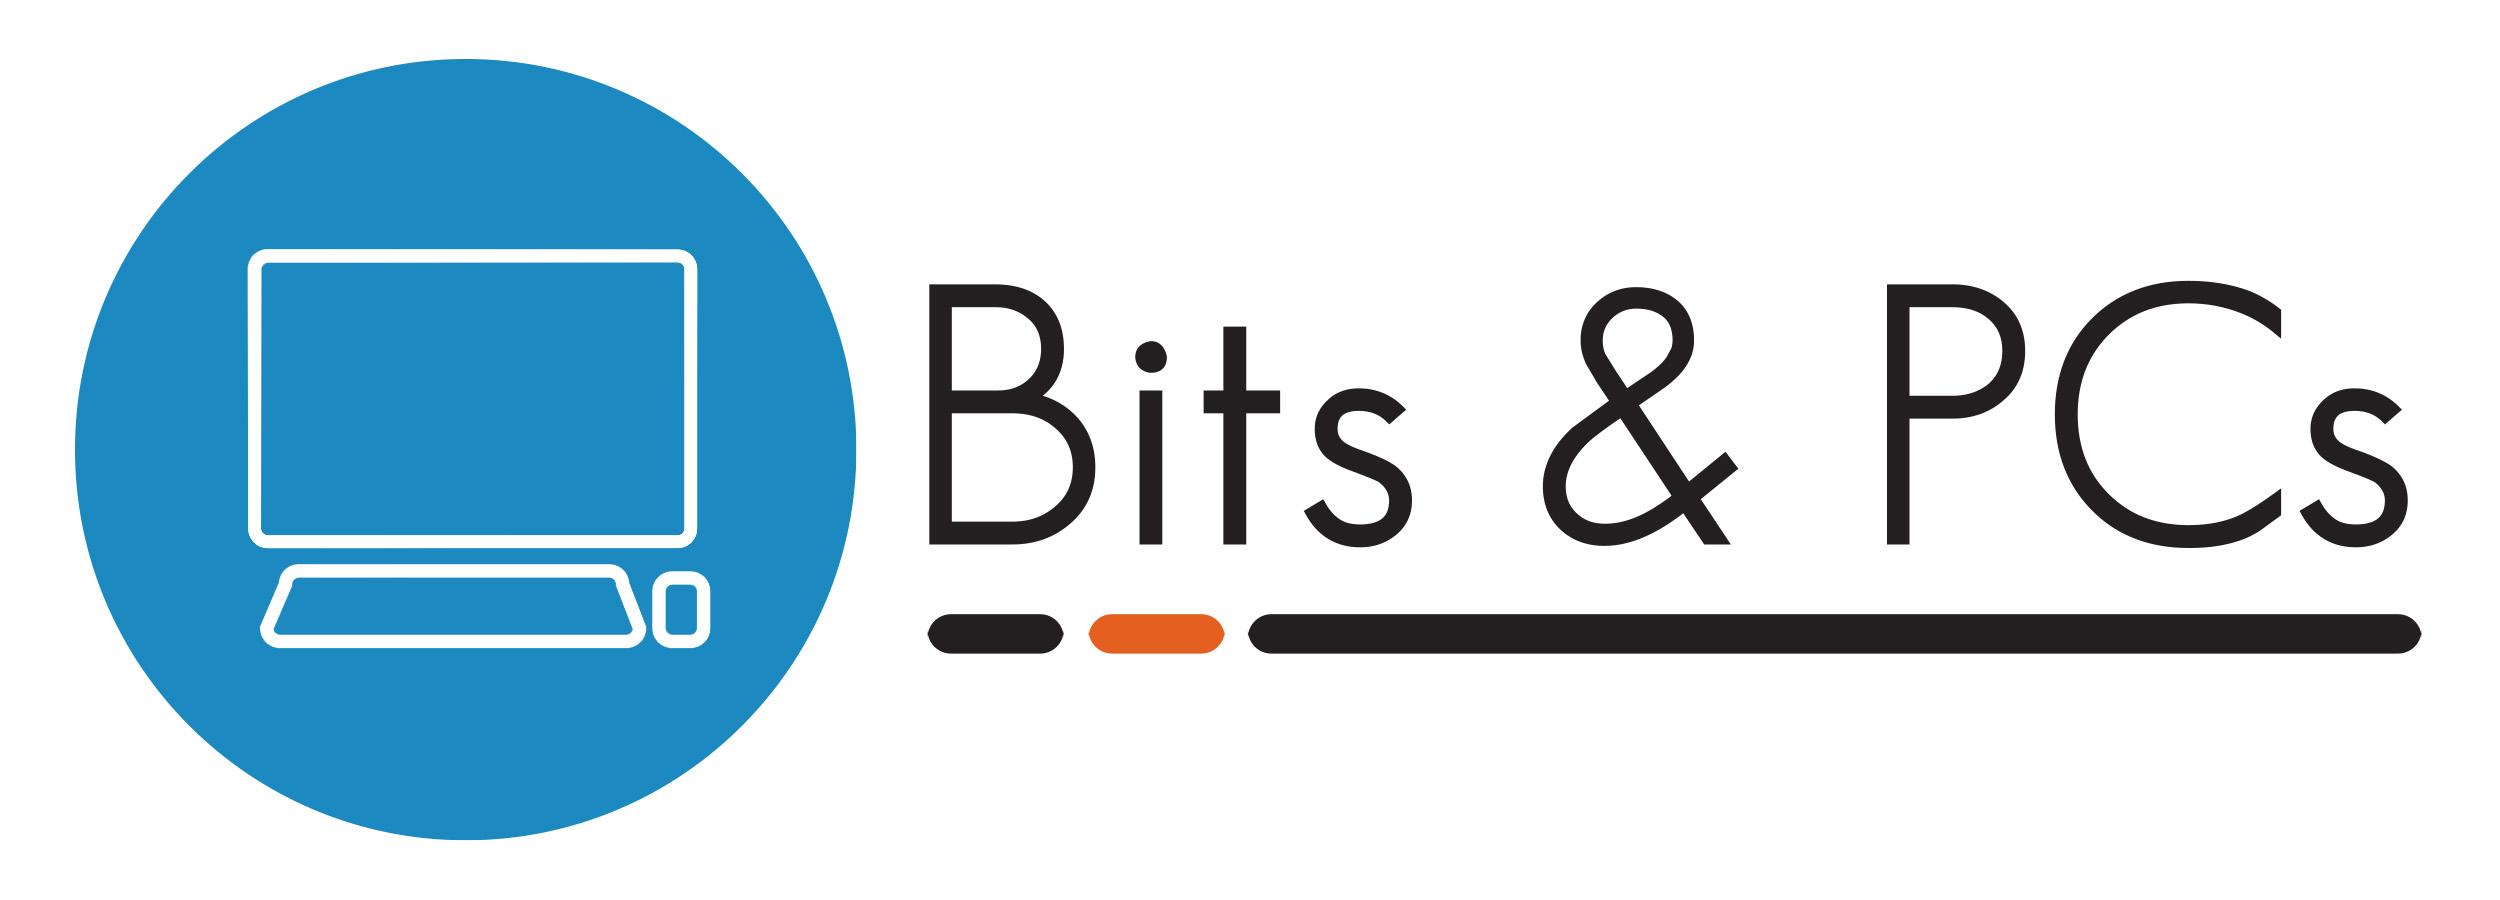 Read bits and pcs Reviews